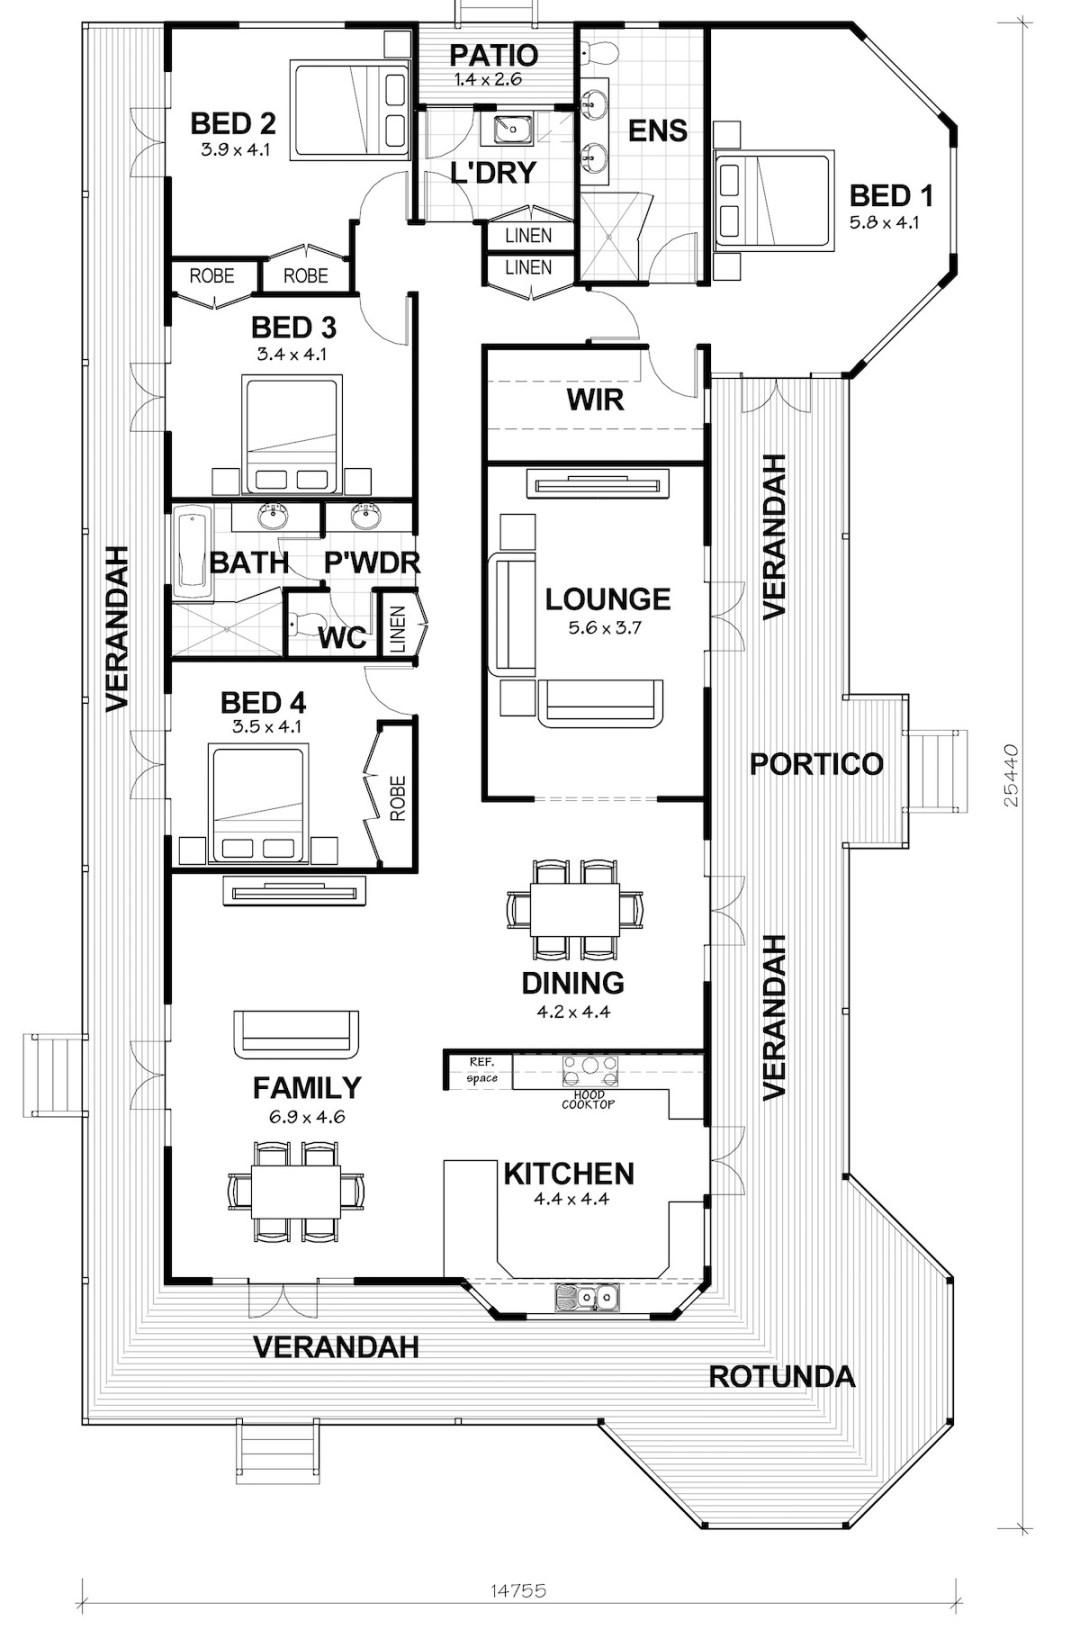 The Rosewood Floorplan